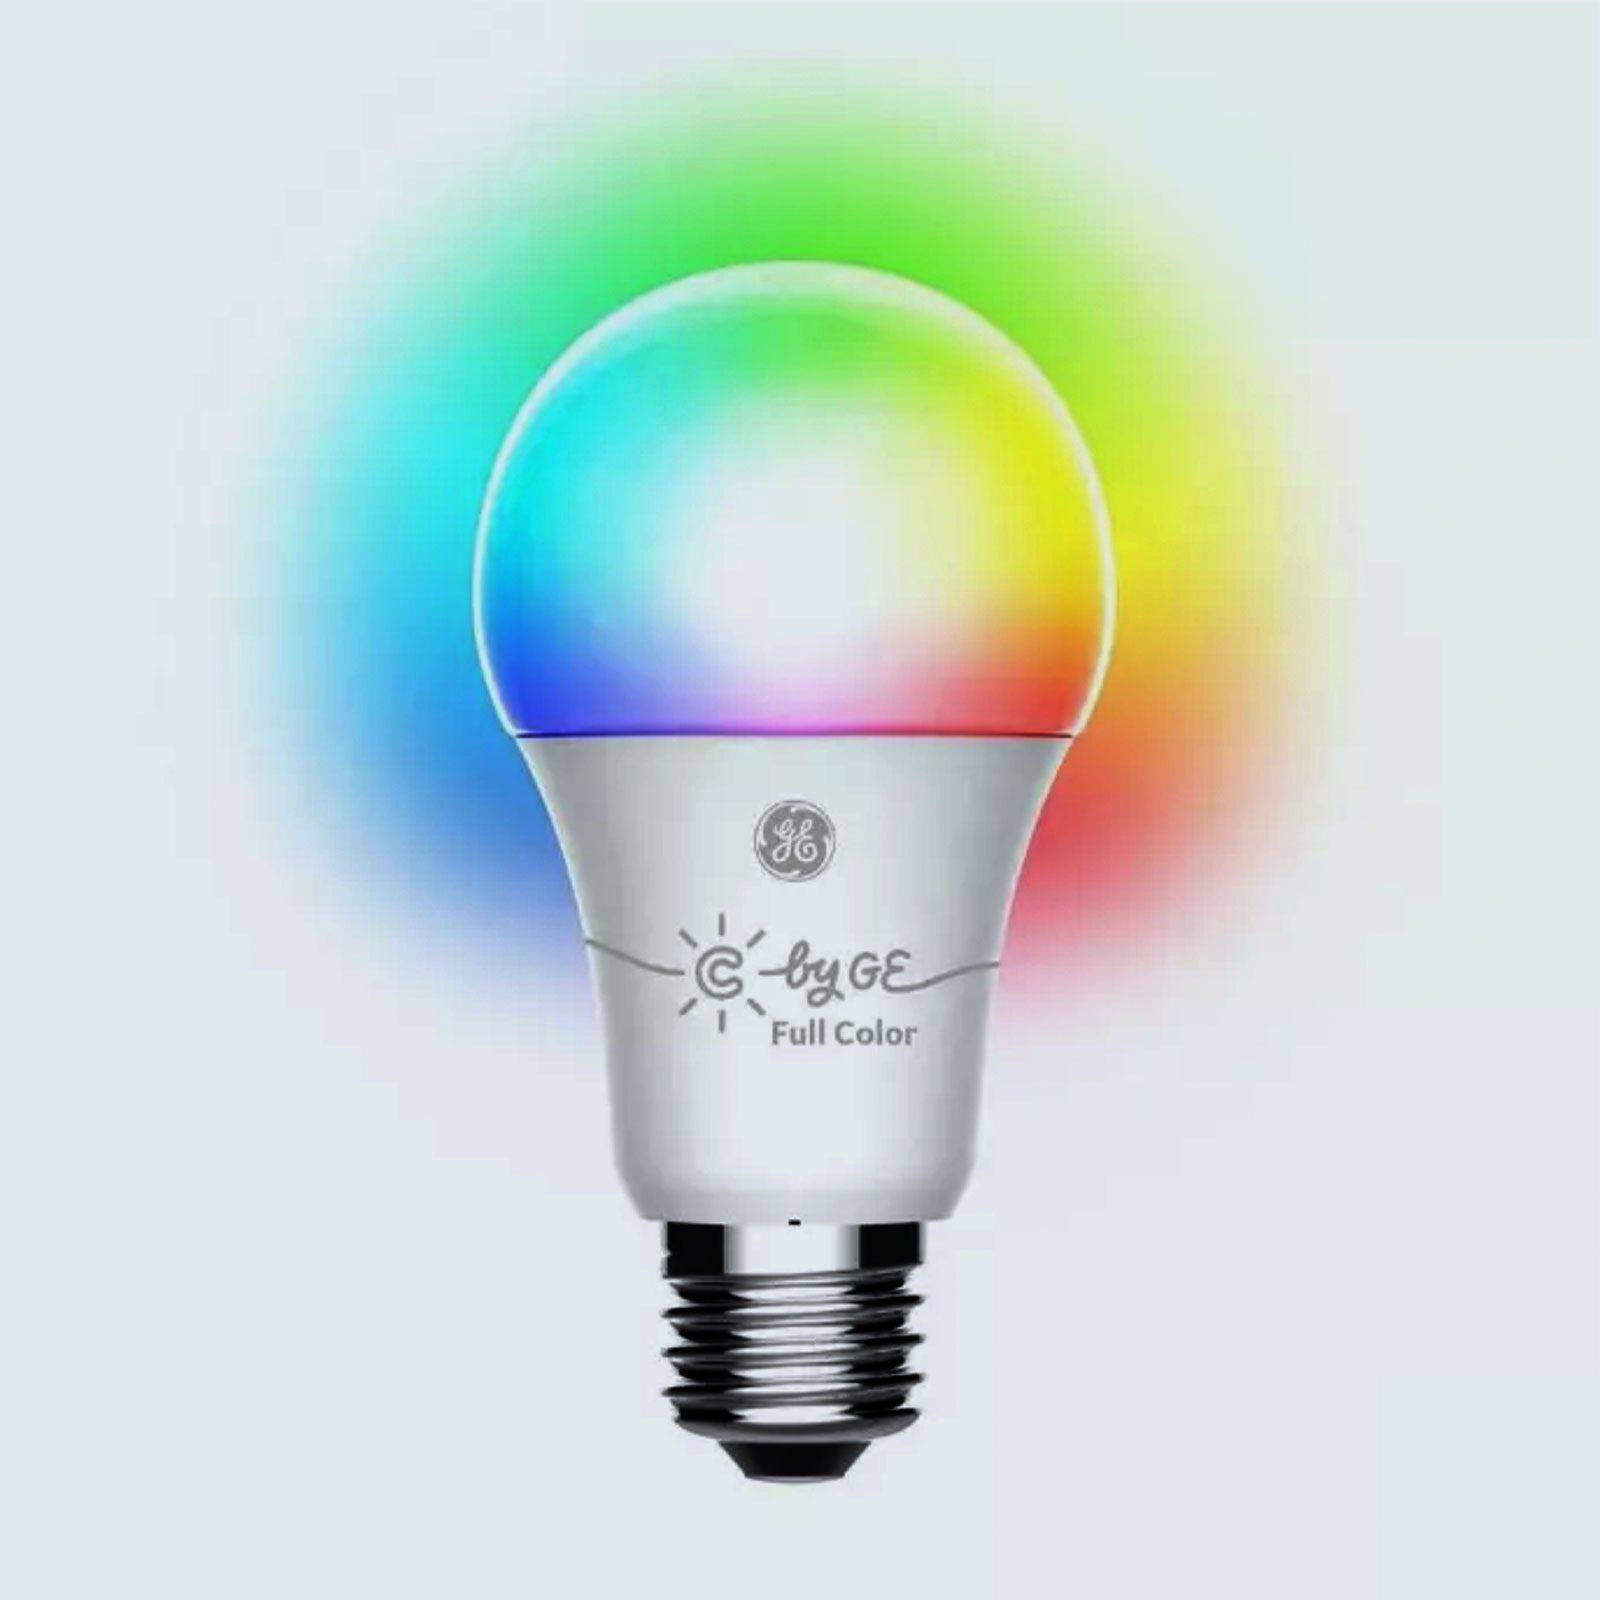 General Electric Full Color Smart LED Bulb